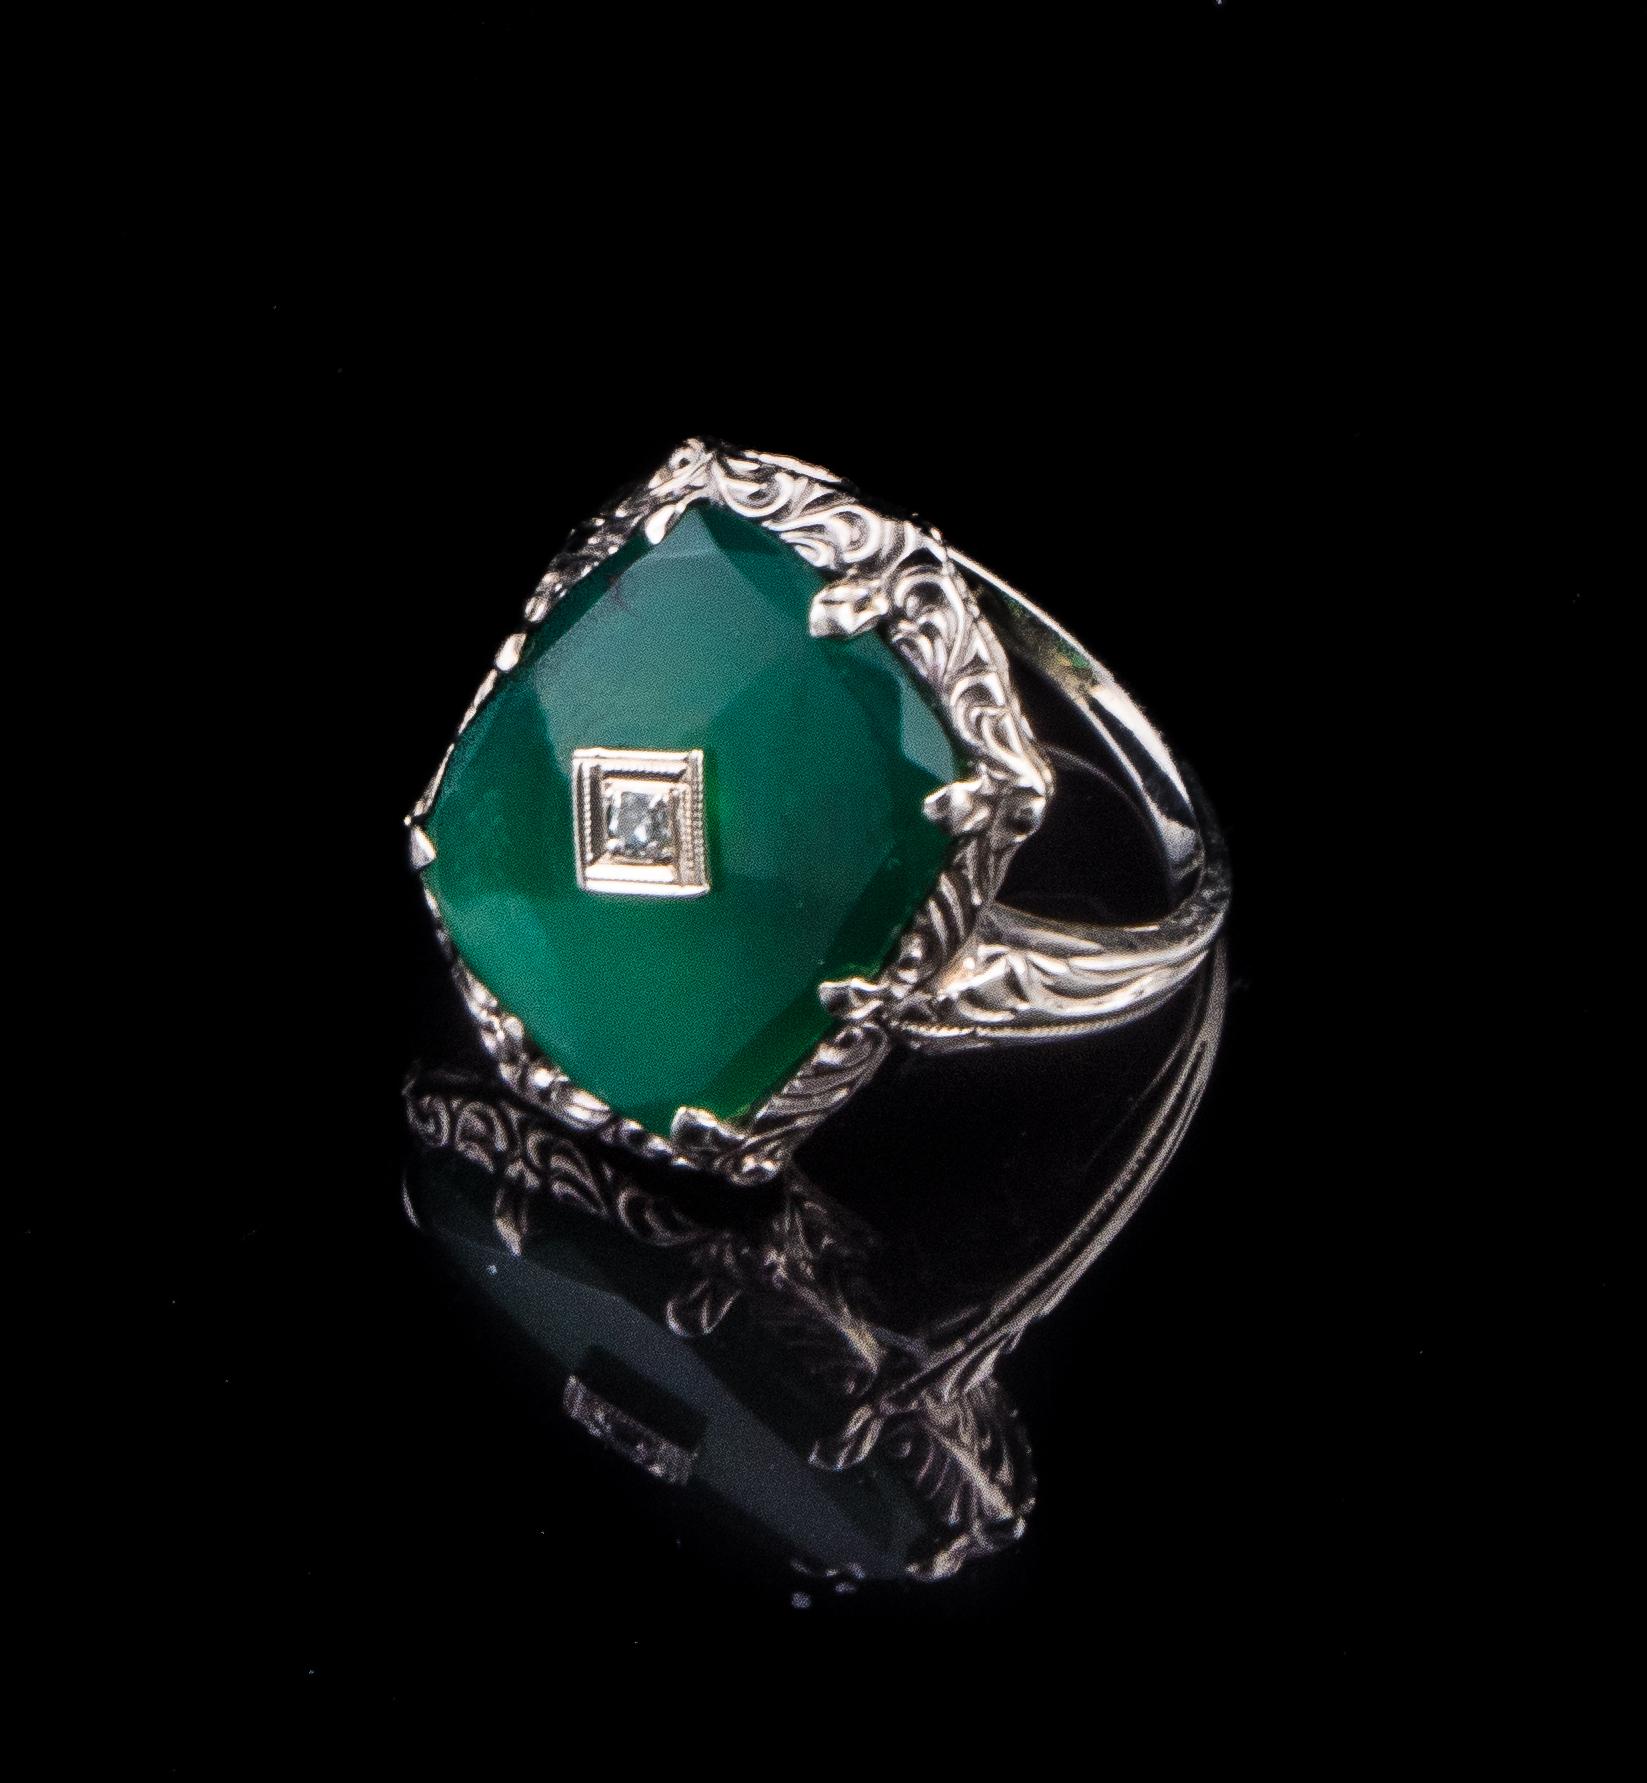 Art Deco 14kt green onyx ring with diamonds